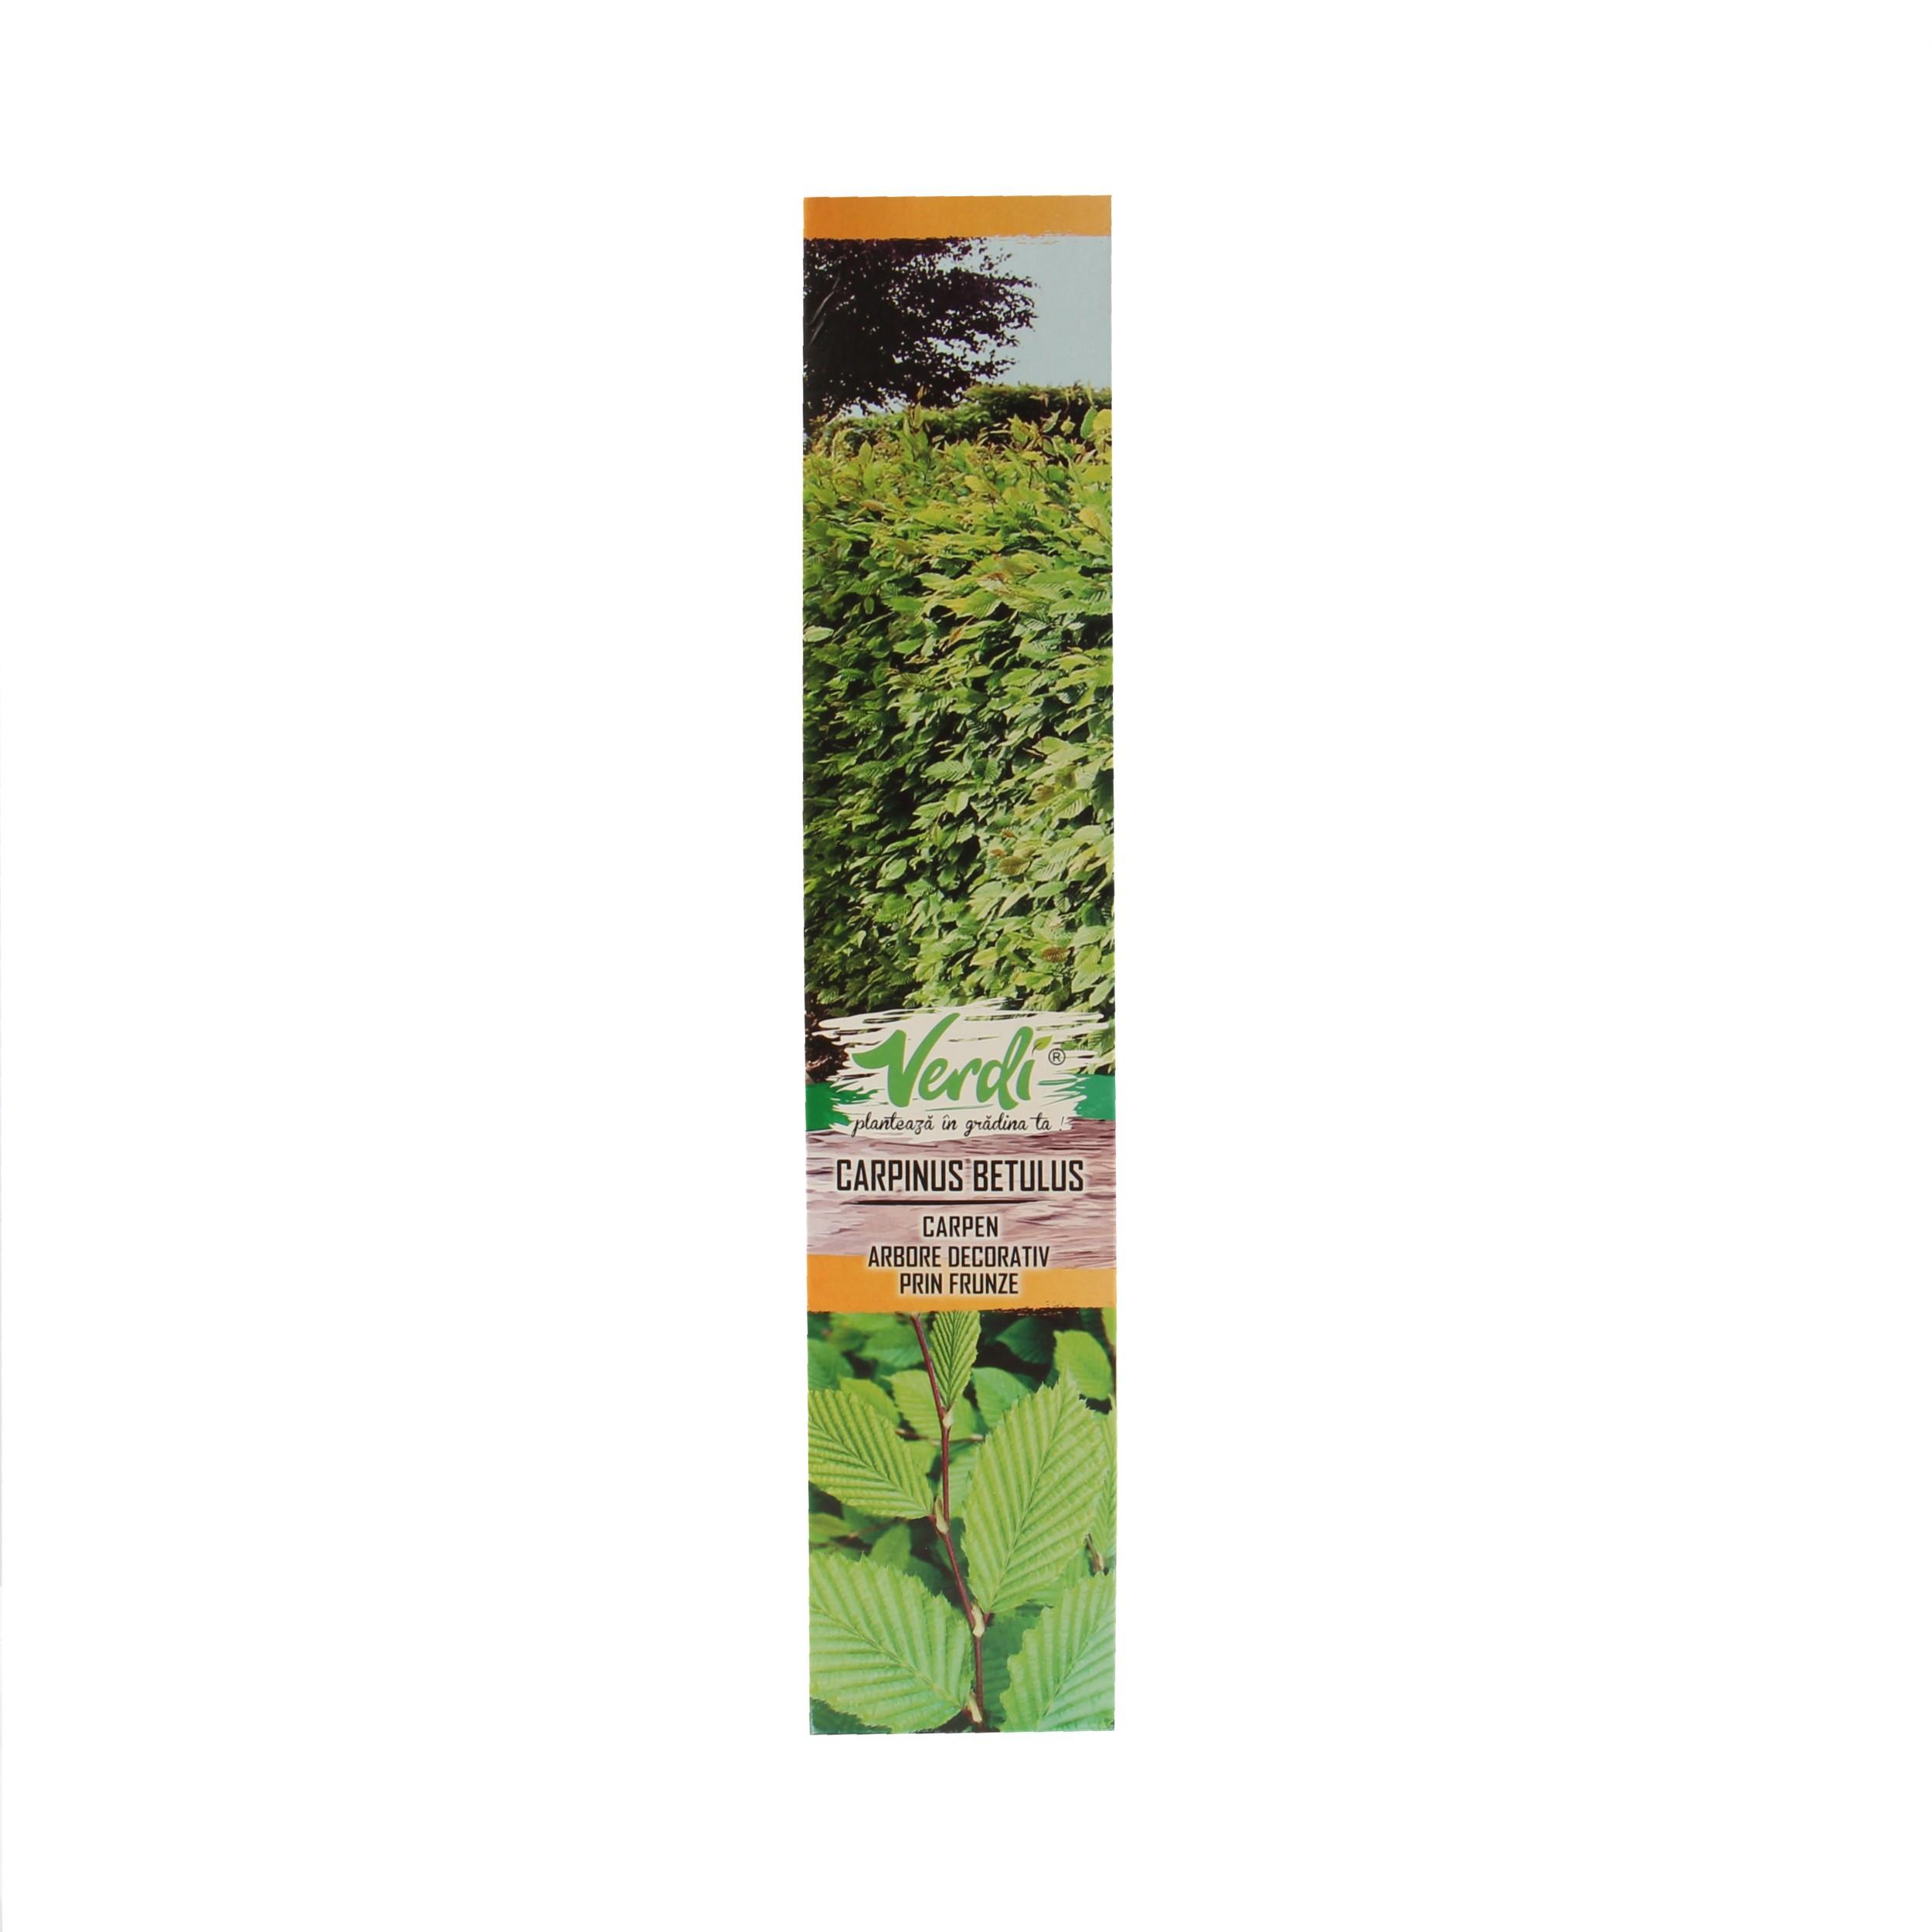 Dedeman Arbore Ornamental Carpen Carpinus Betulus H 15 25 Cm